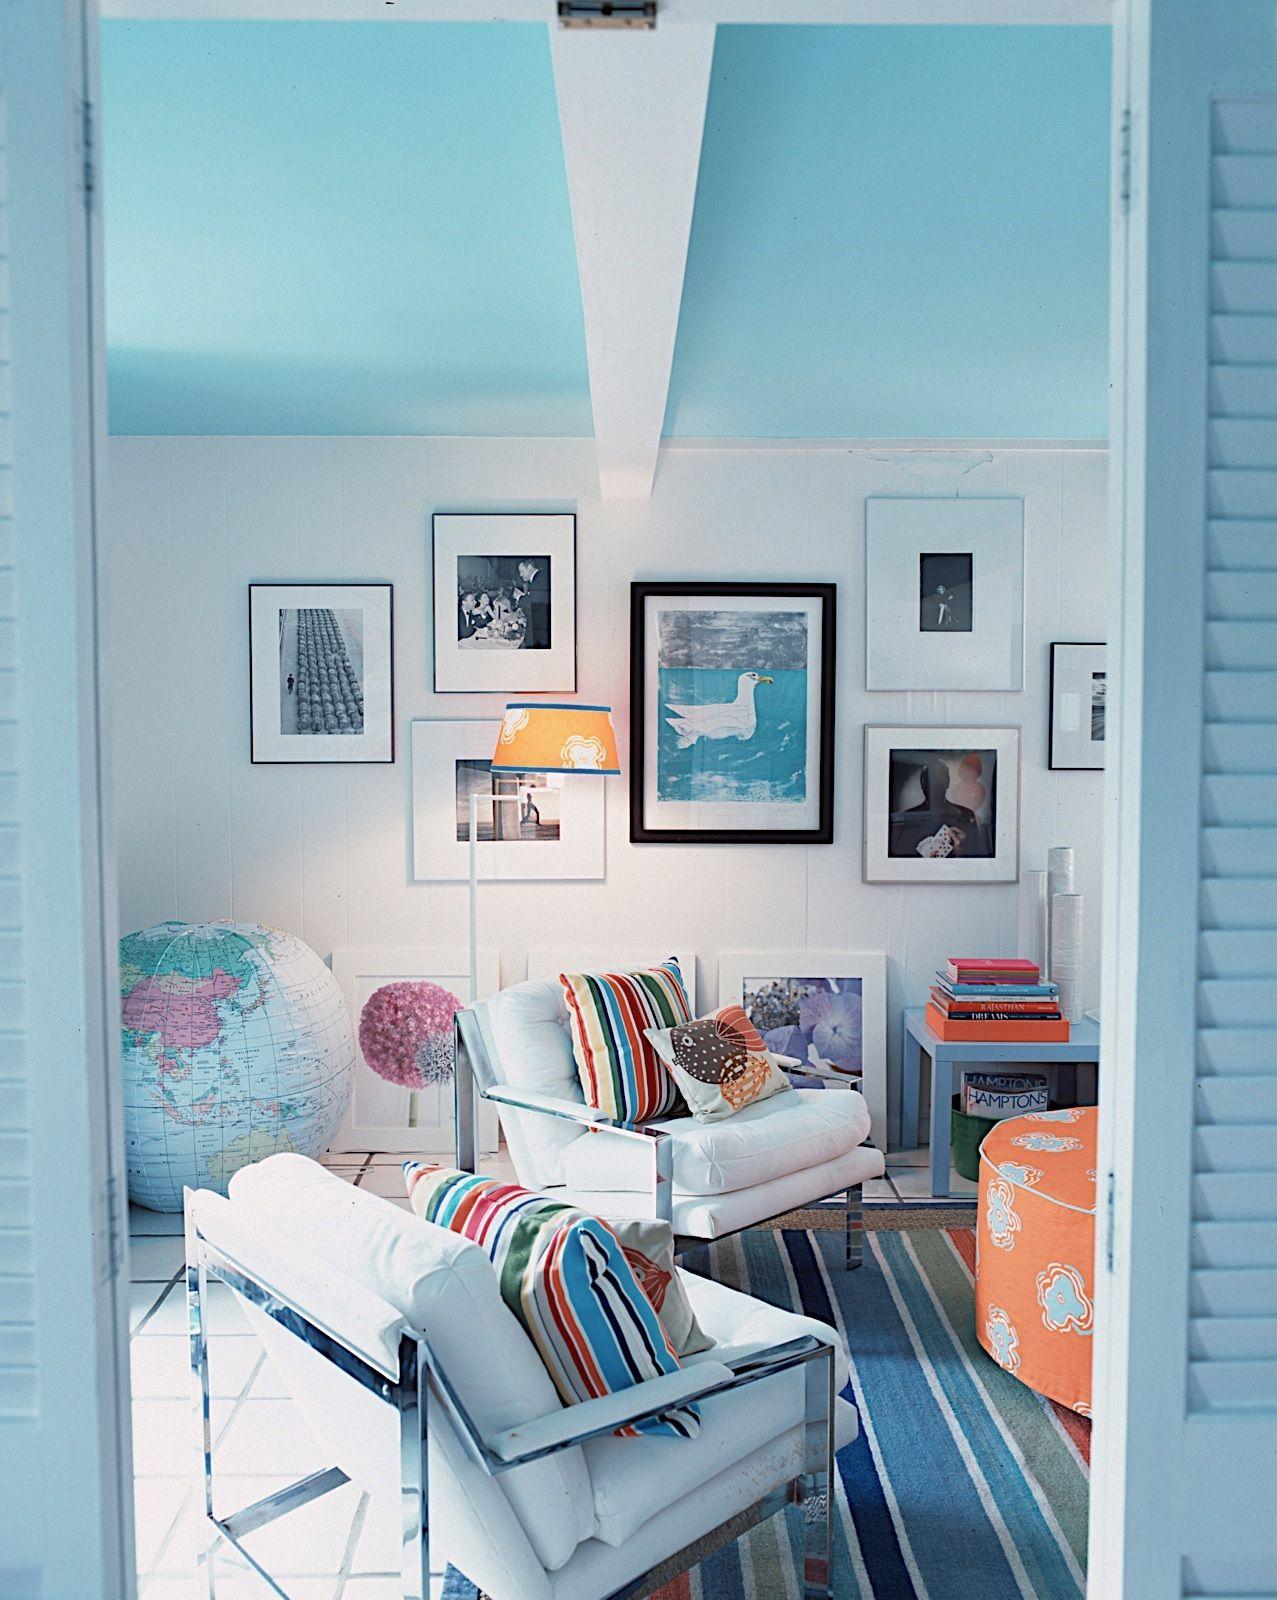 Dorm Room Ideas For Girls Minimalist